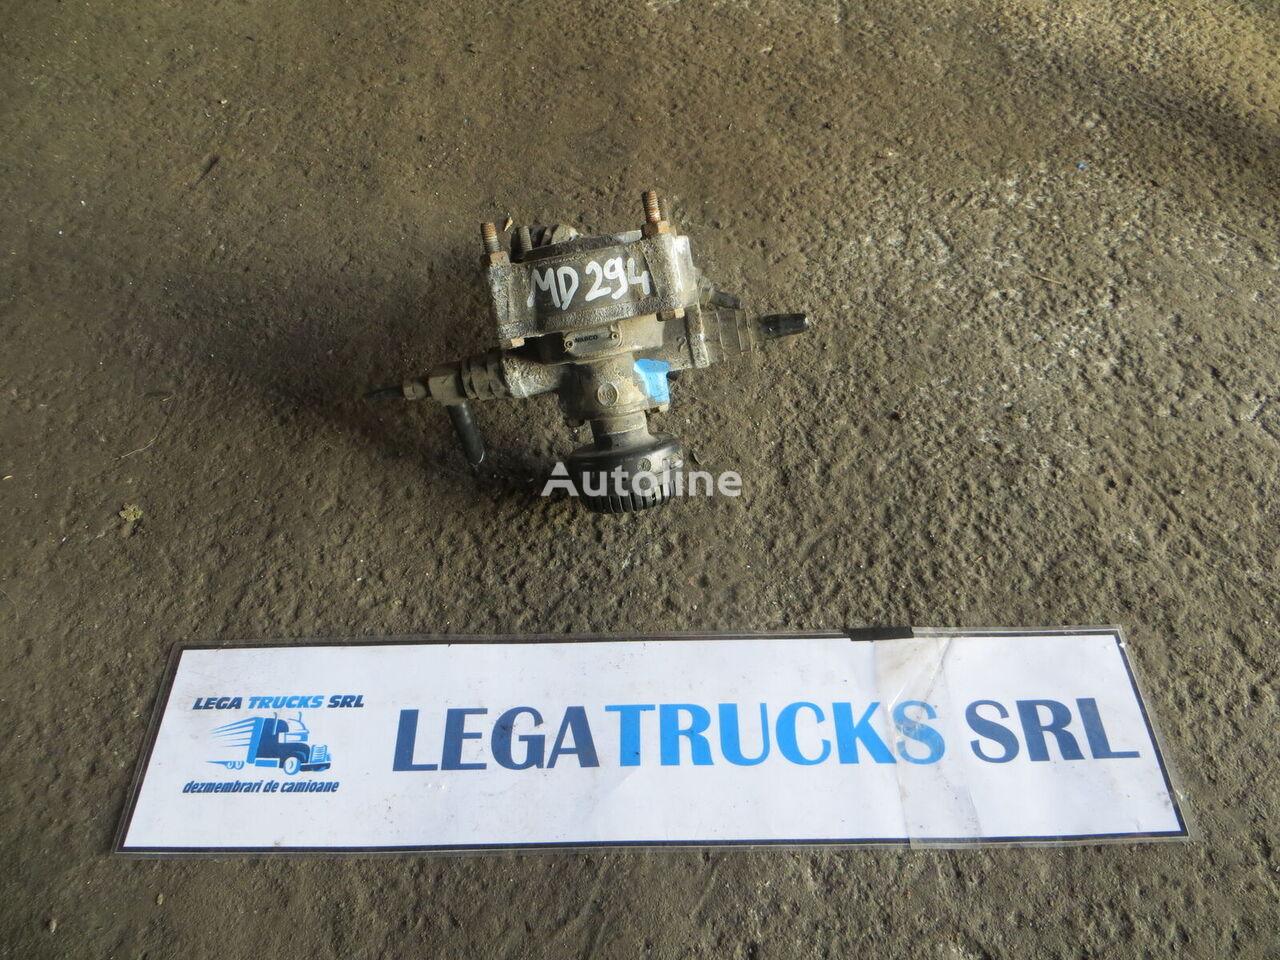 MAN Supapa Releu pneumatic valve for MAN TGA TGX  tractor unit